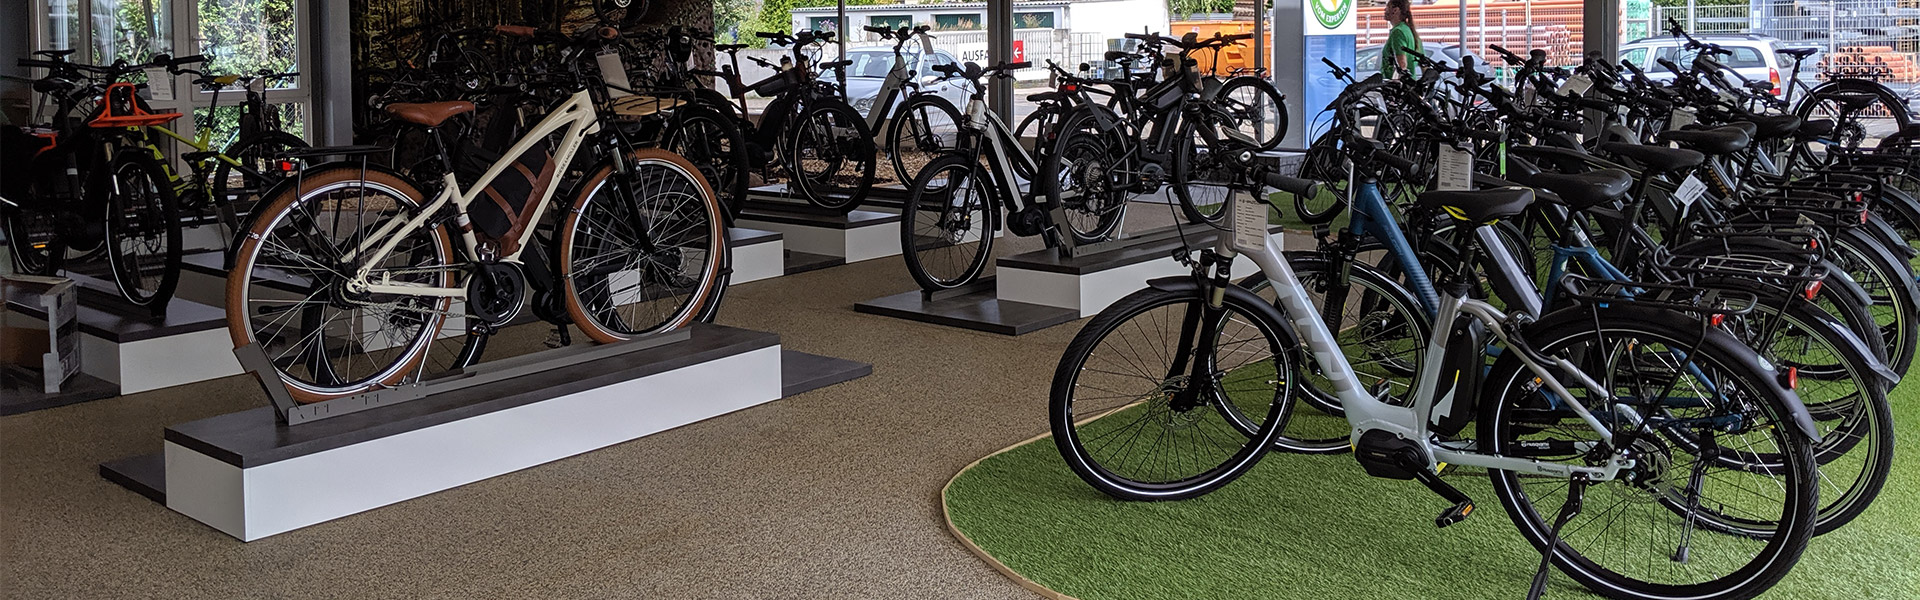 Der Shop der e-motion e-Bike Welt Heidelberg